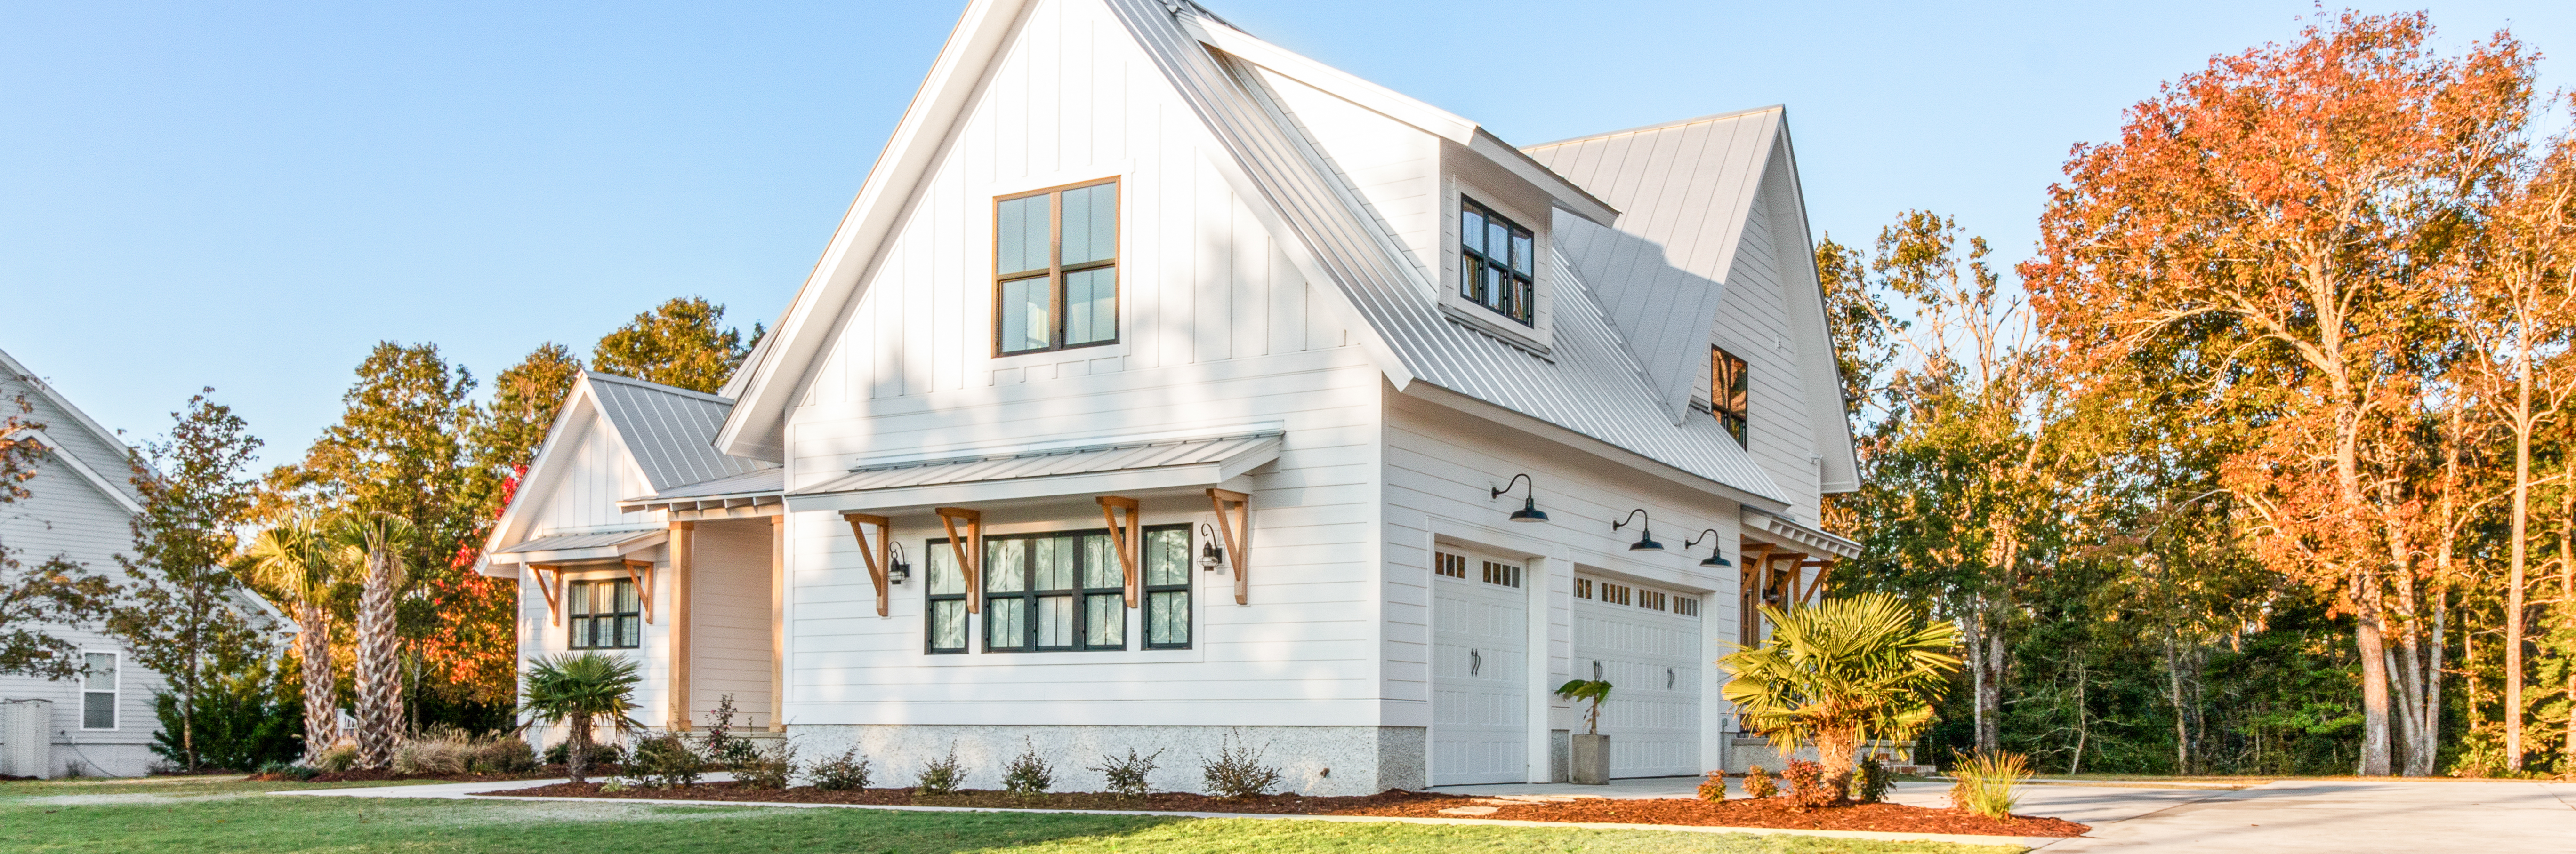 Longshore Custom Homes 103 Ext-1